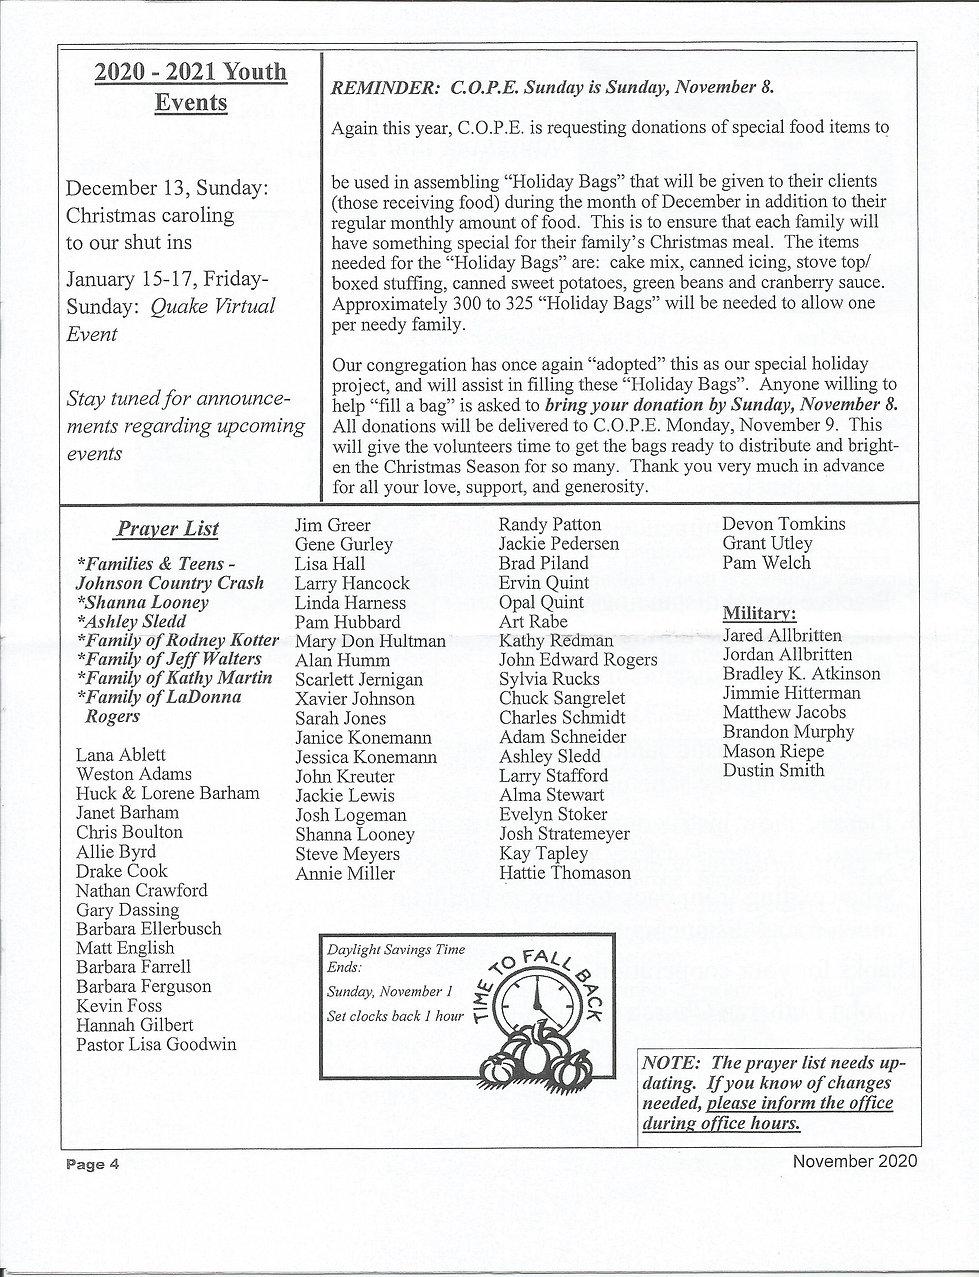 November Page 4.jpg